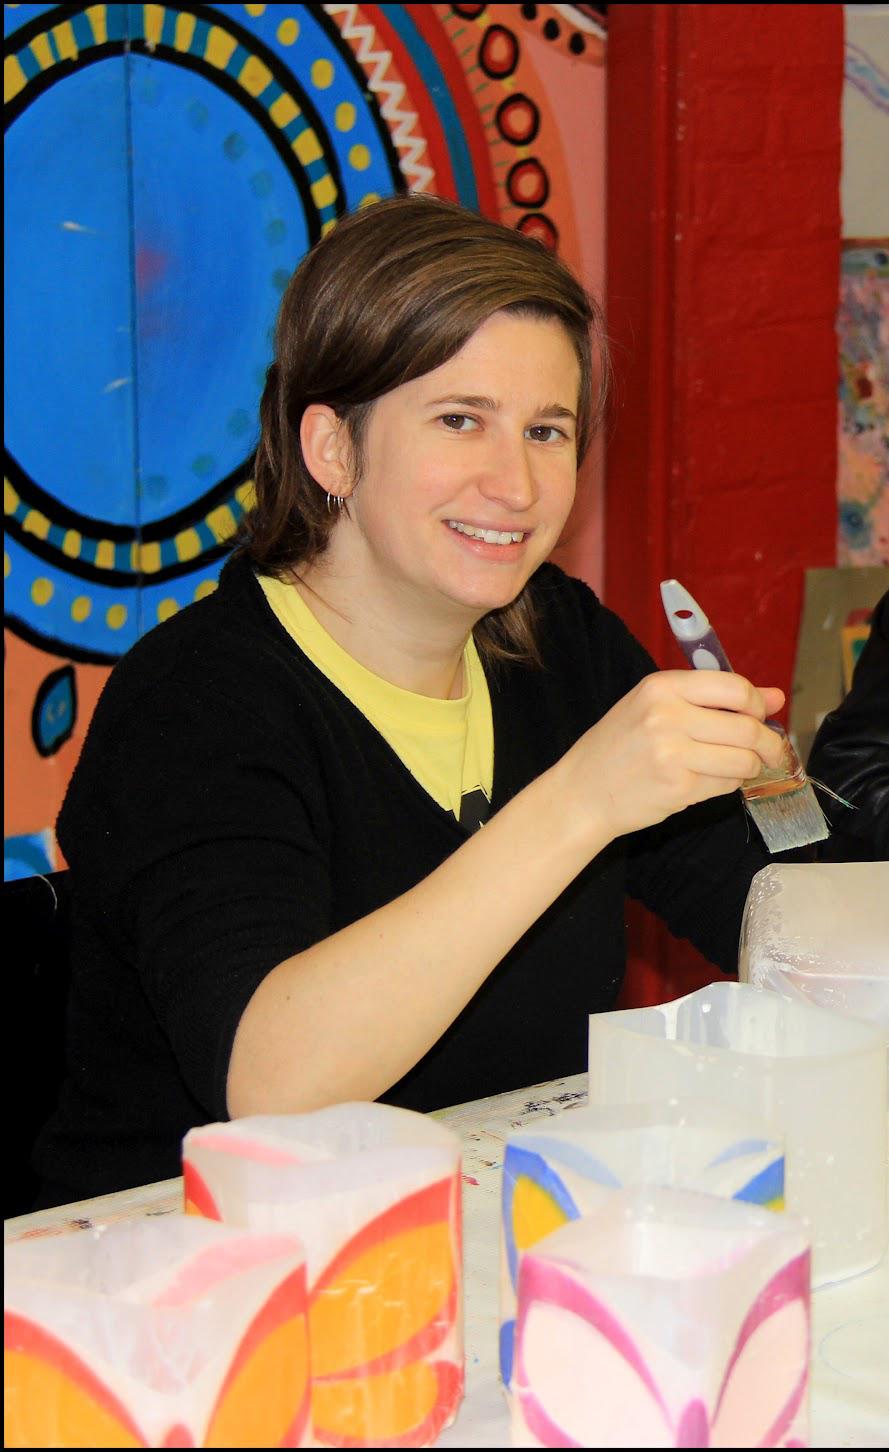 Emma Johnson painting lanterns